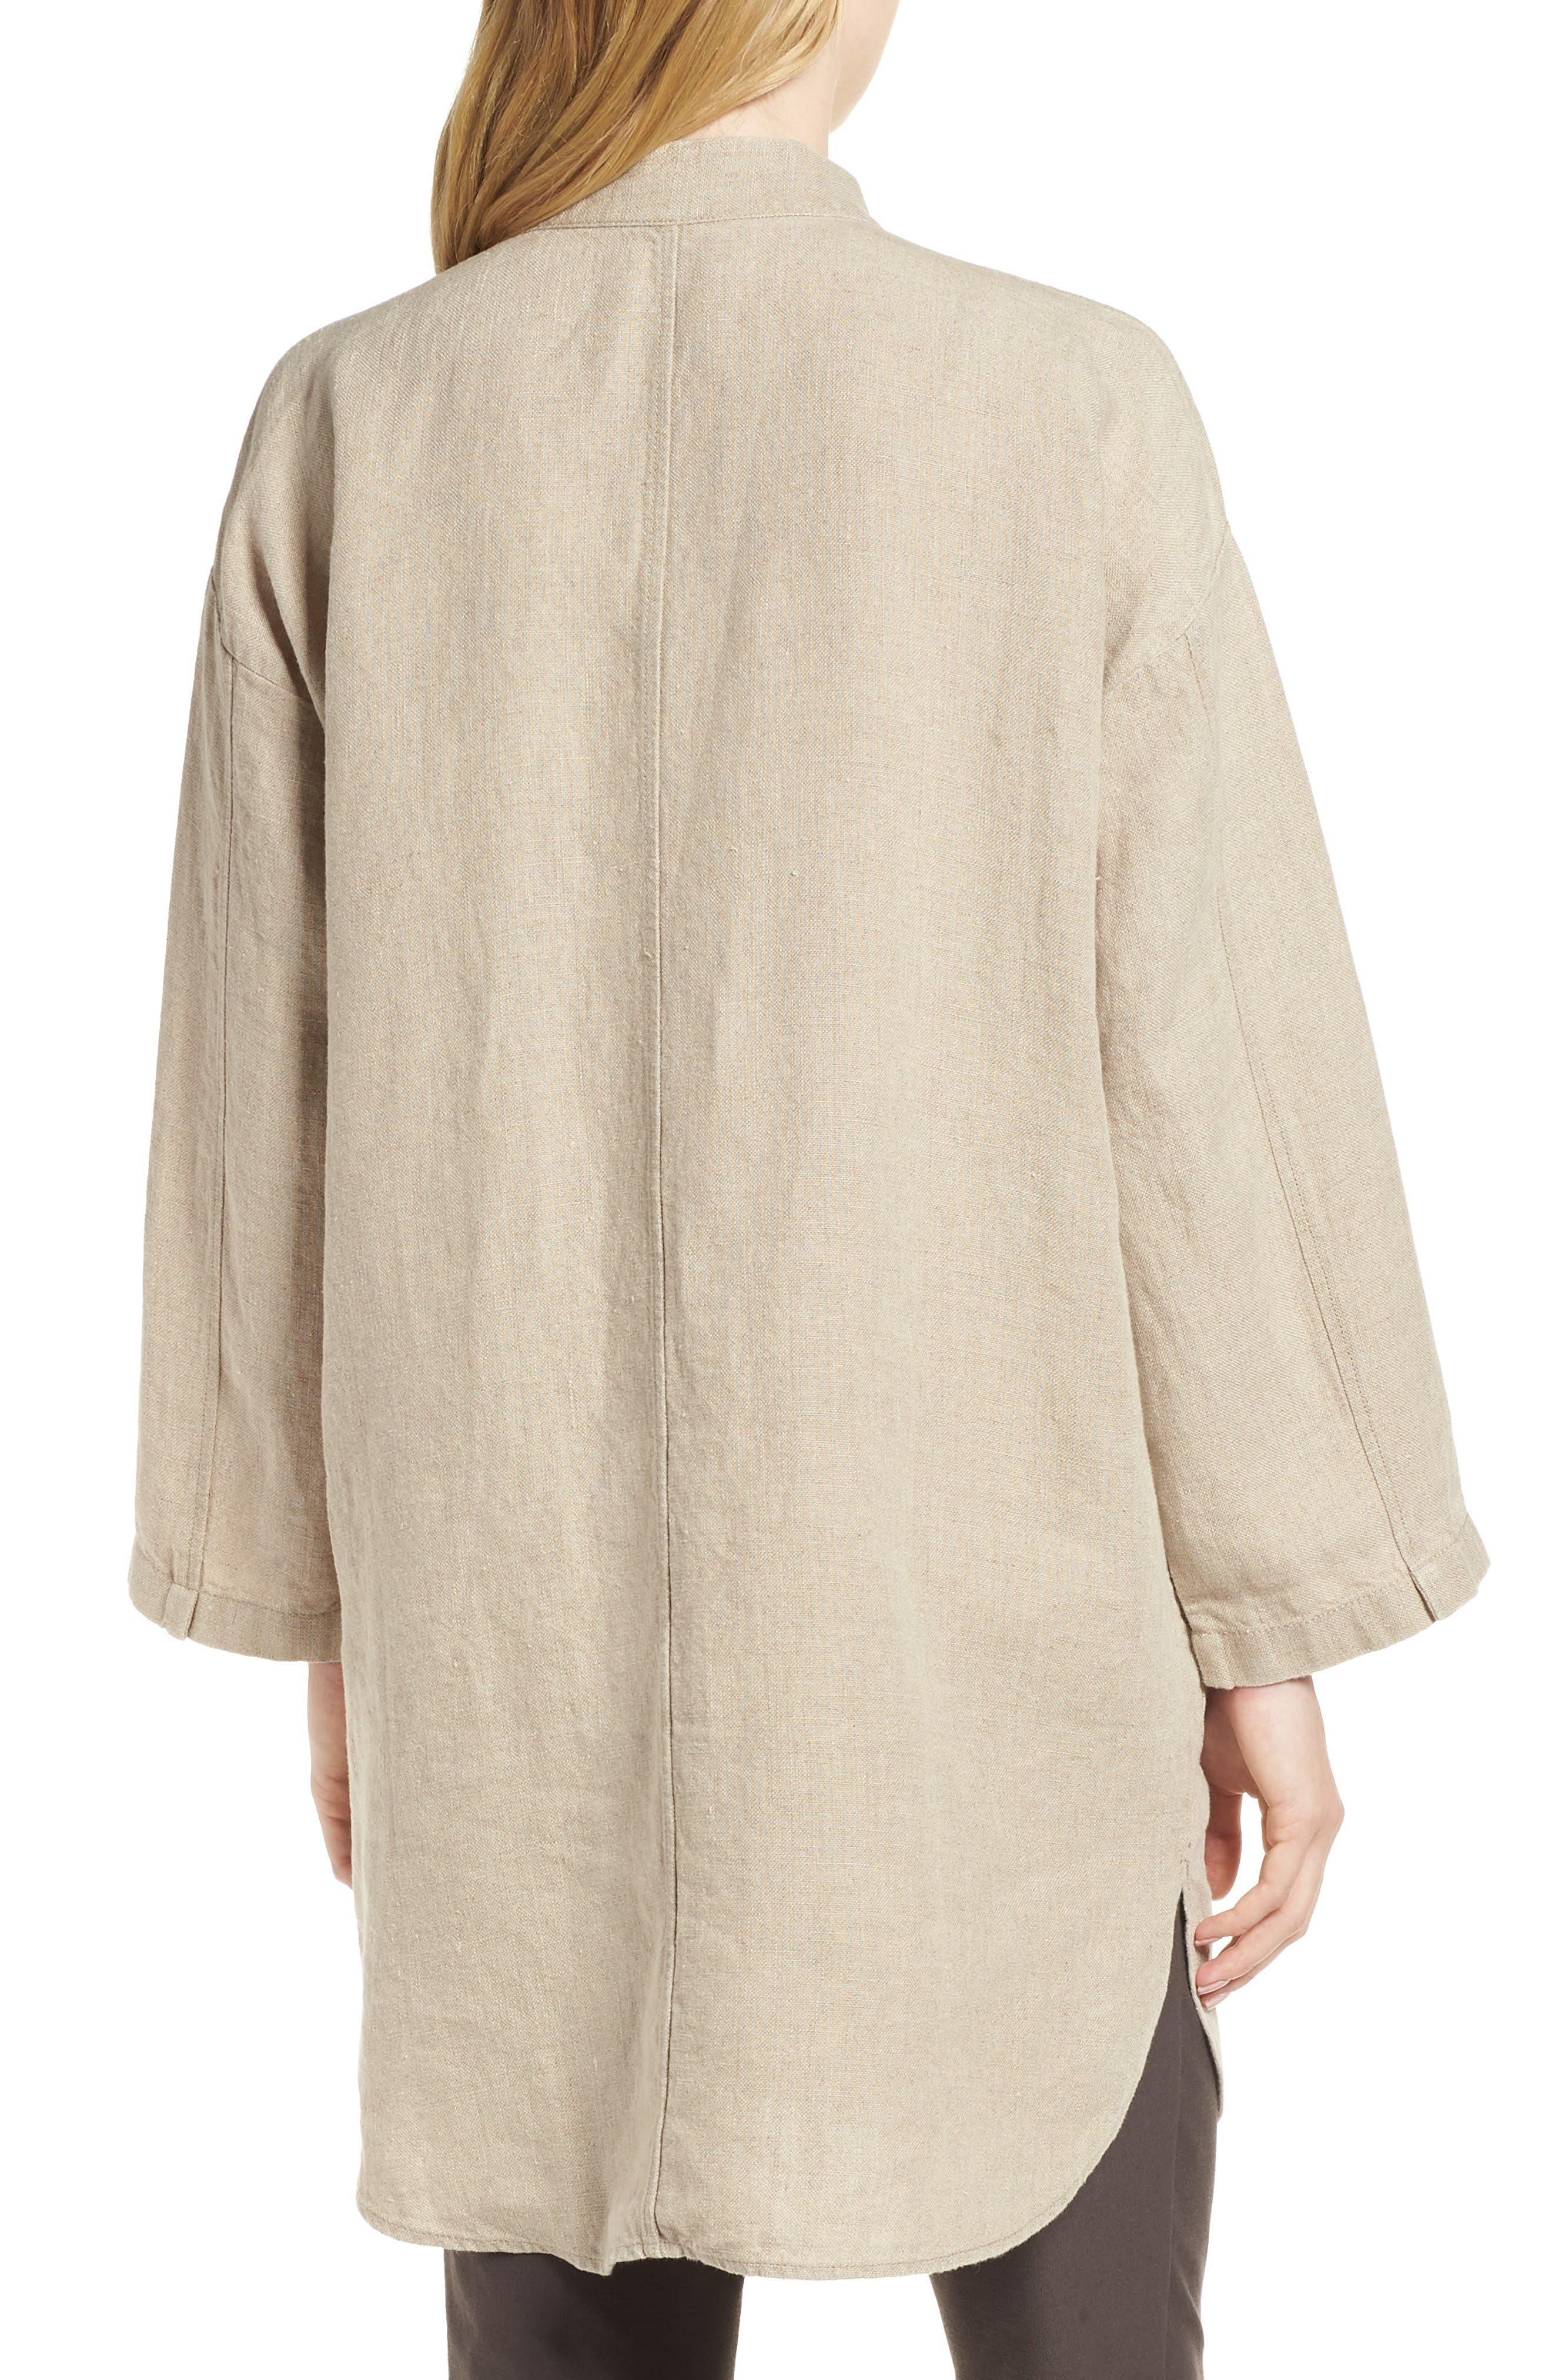 Organic Linen Jacket,                             Alternate thumbnail 2, color,                             Undyed Natural